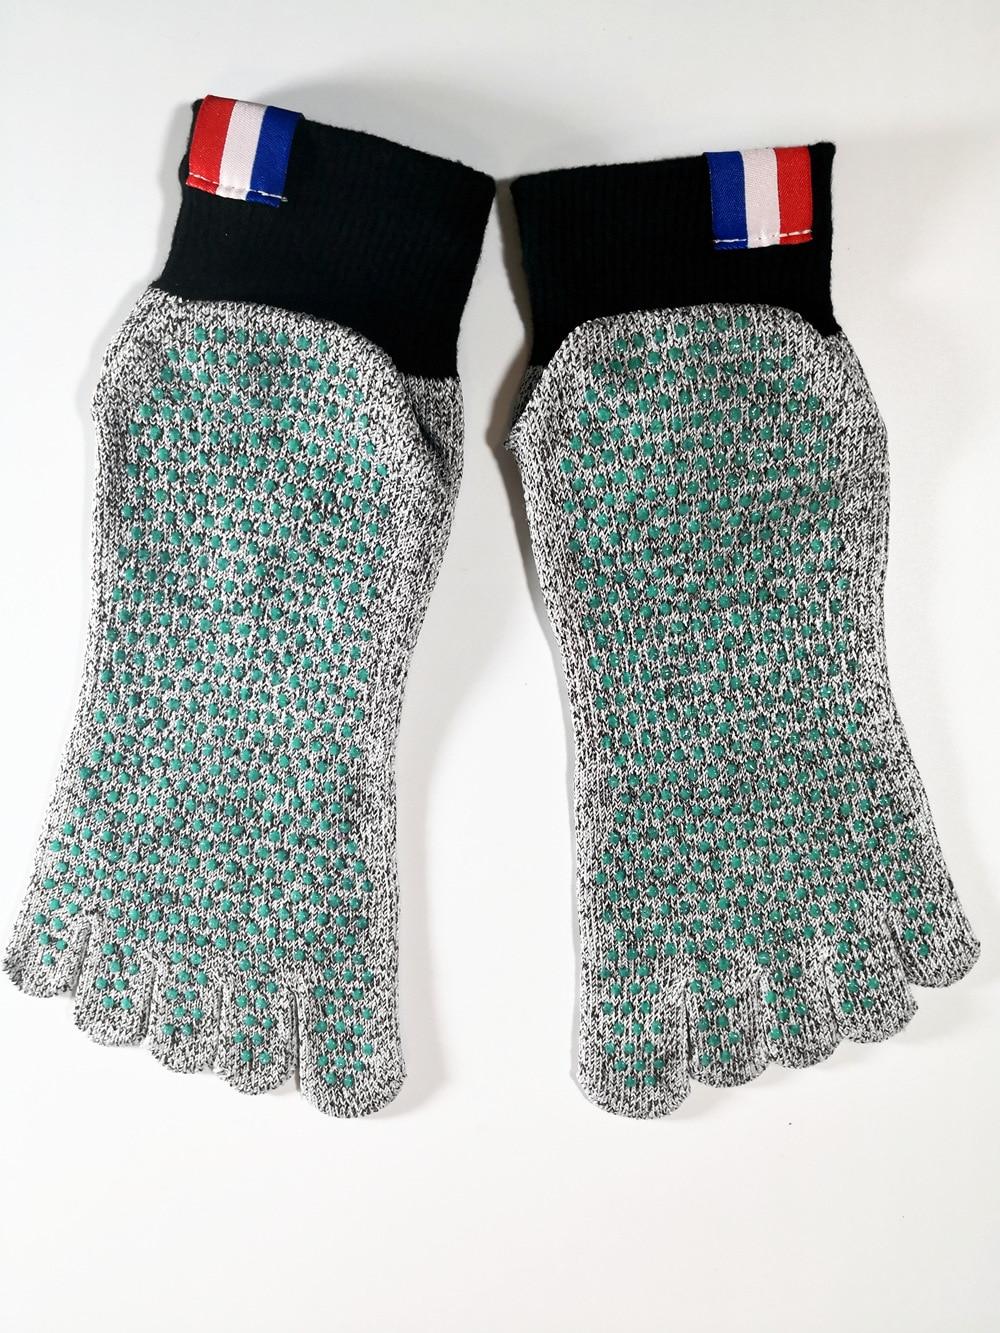 HPPE Short Beach Socks Diving Socks Non-slip Dive Snorkeling Swimming Yoga 5 Toe Cut Resistant Socks High Quality